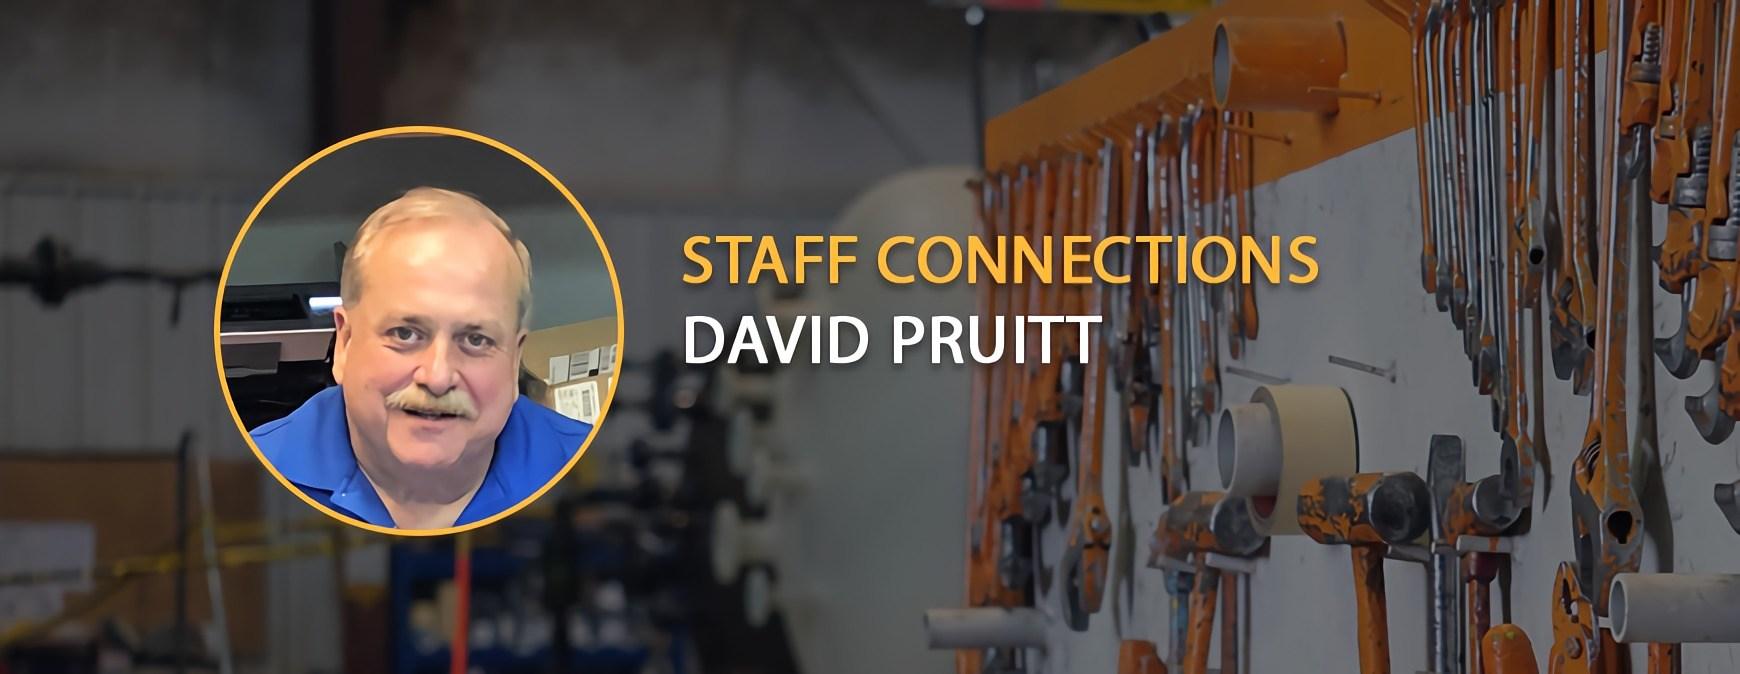 David Pruitt Staff Connection